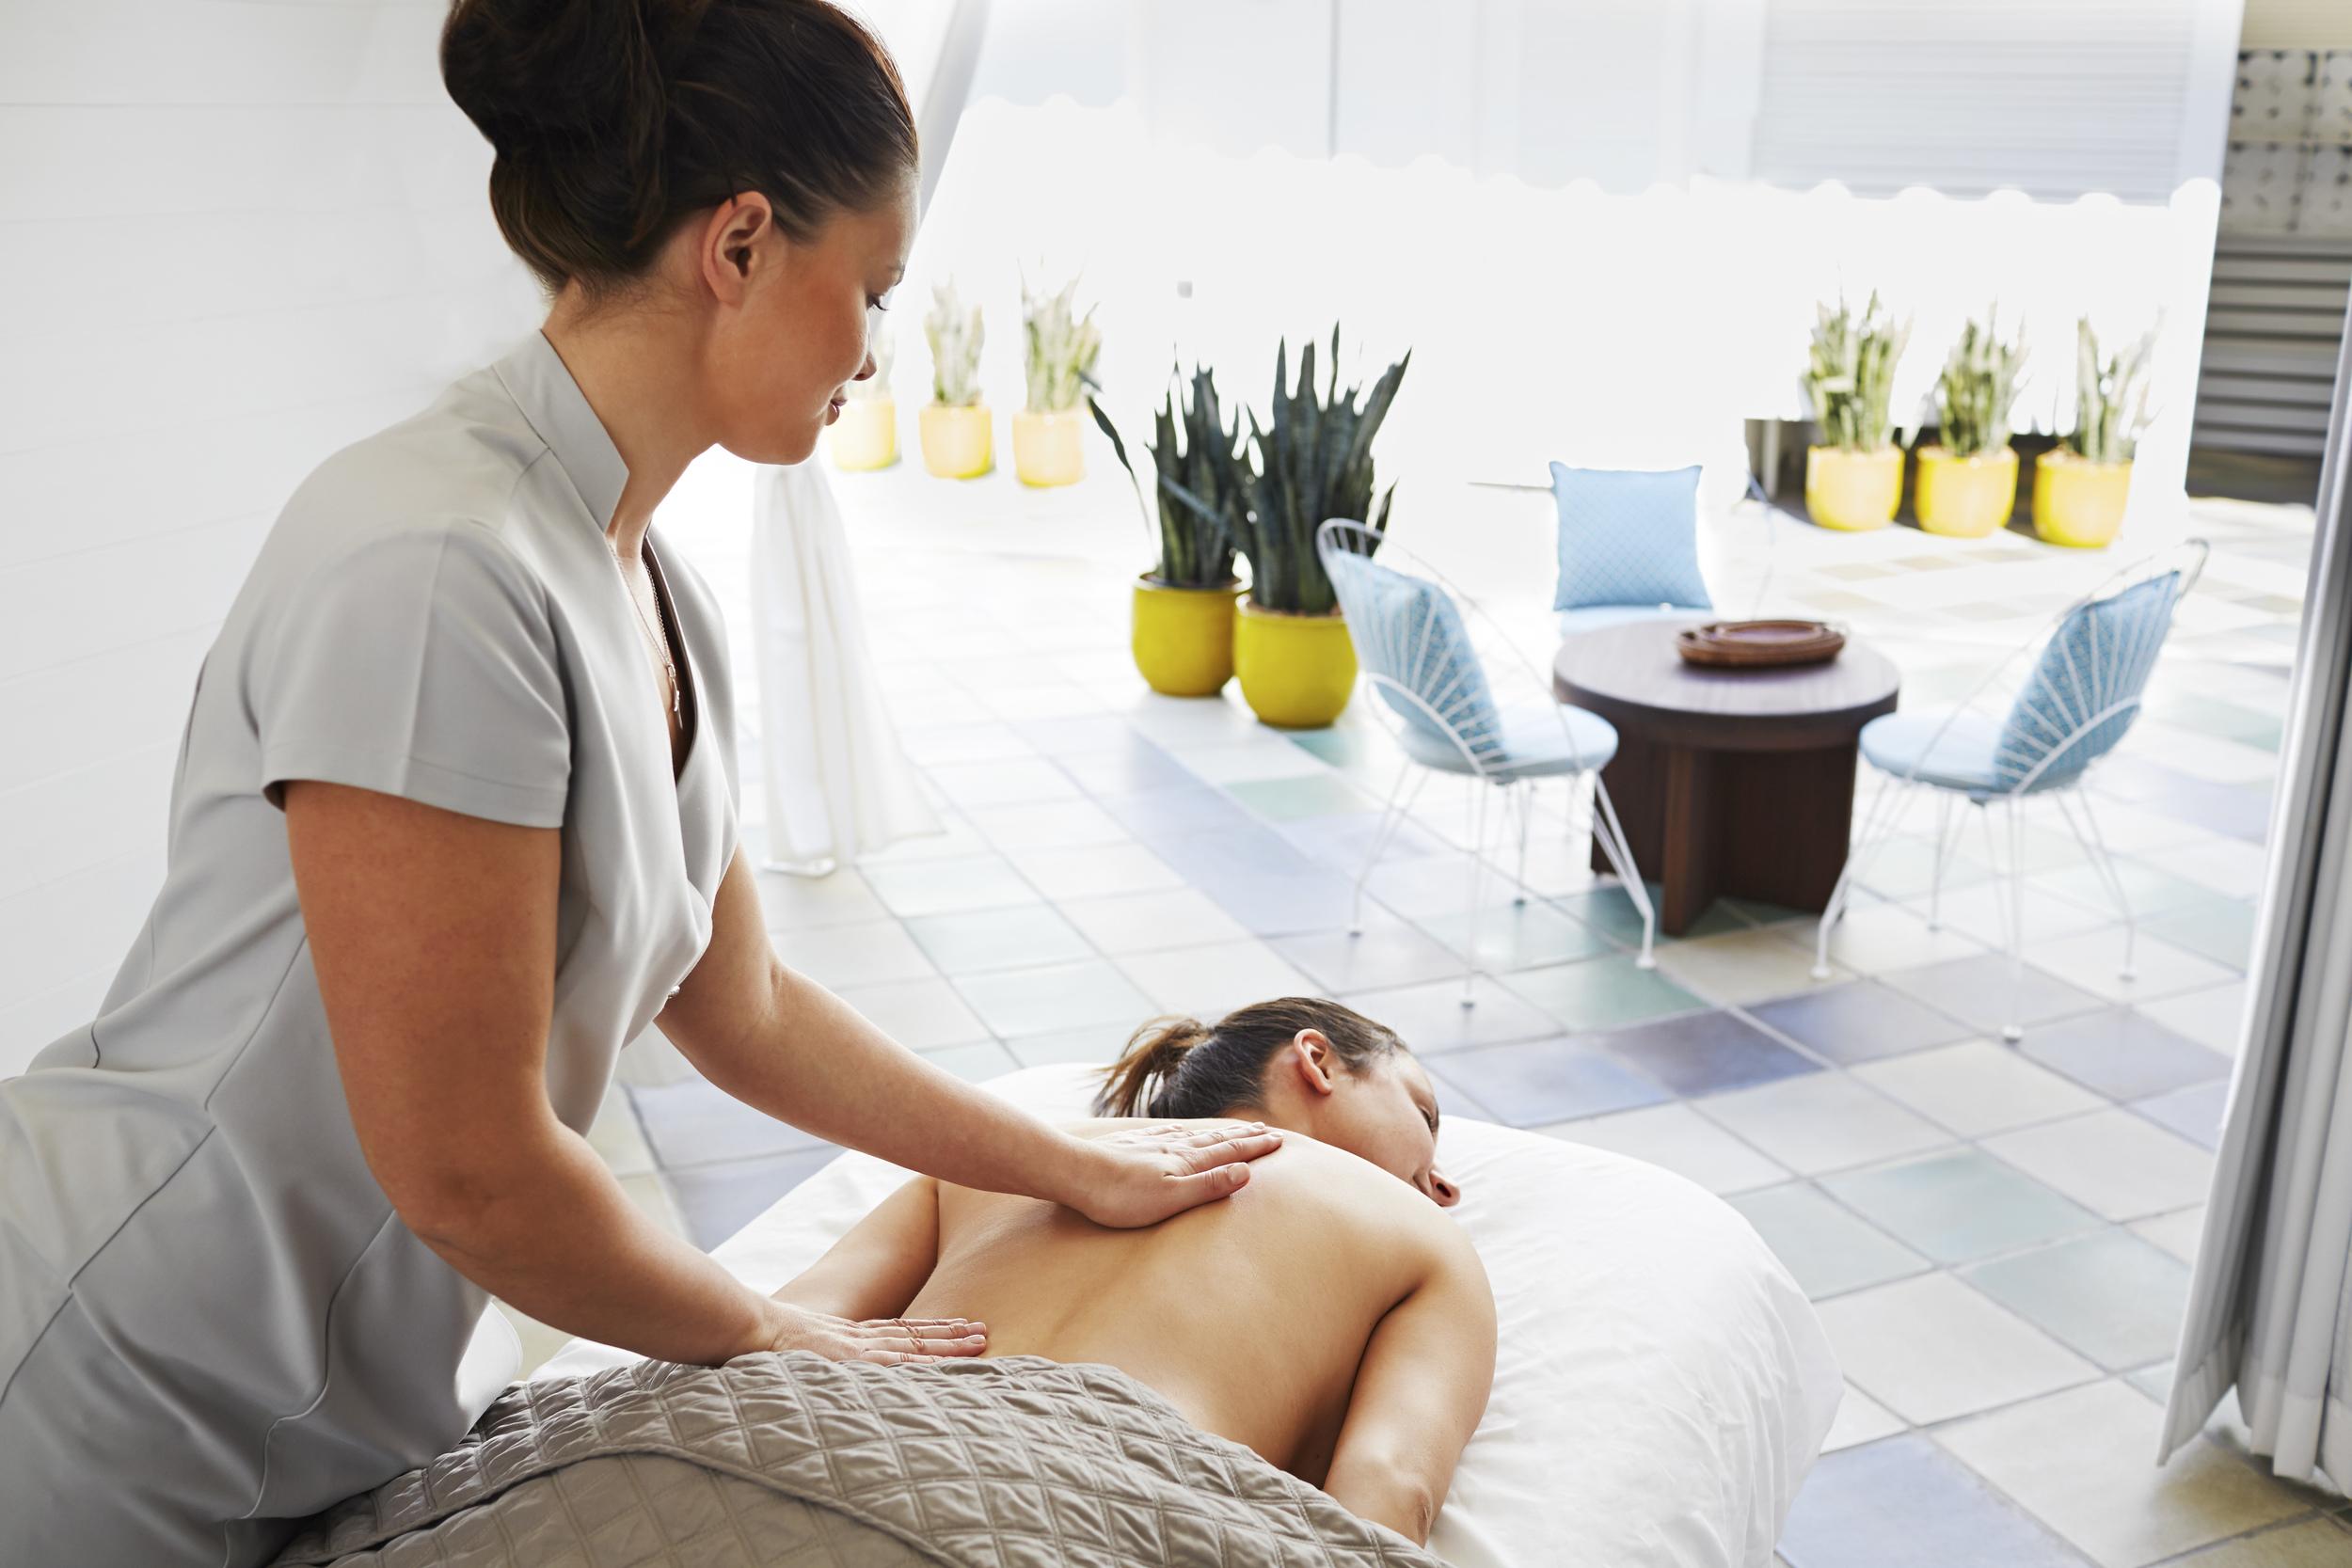 16_Sanders14121_Day 7_Spa Massage_02441RT_RT.jpg